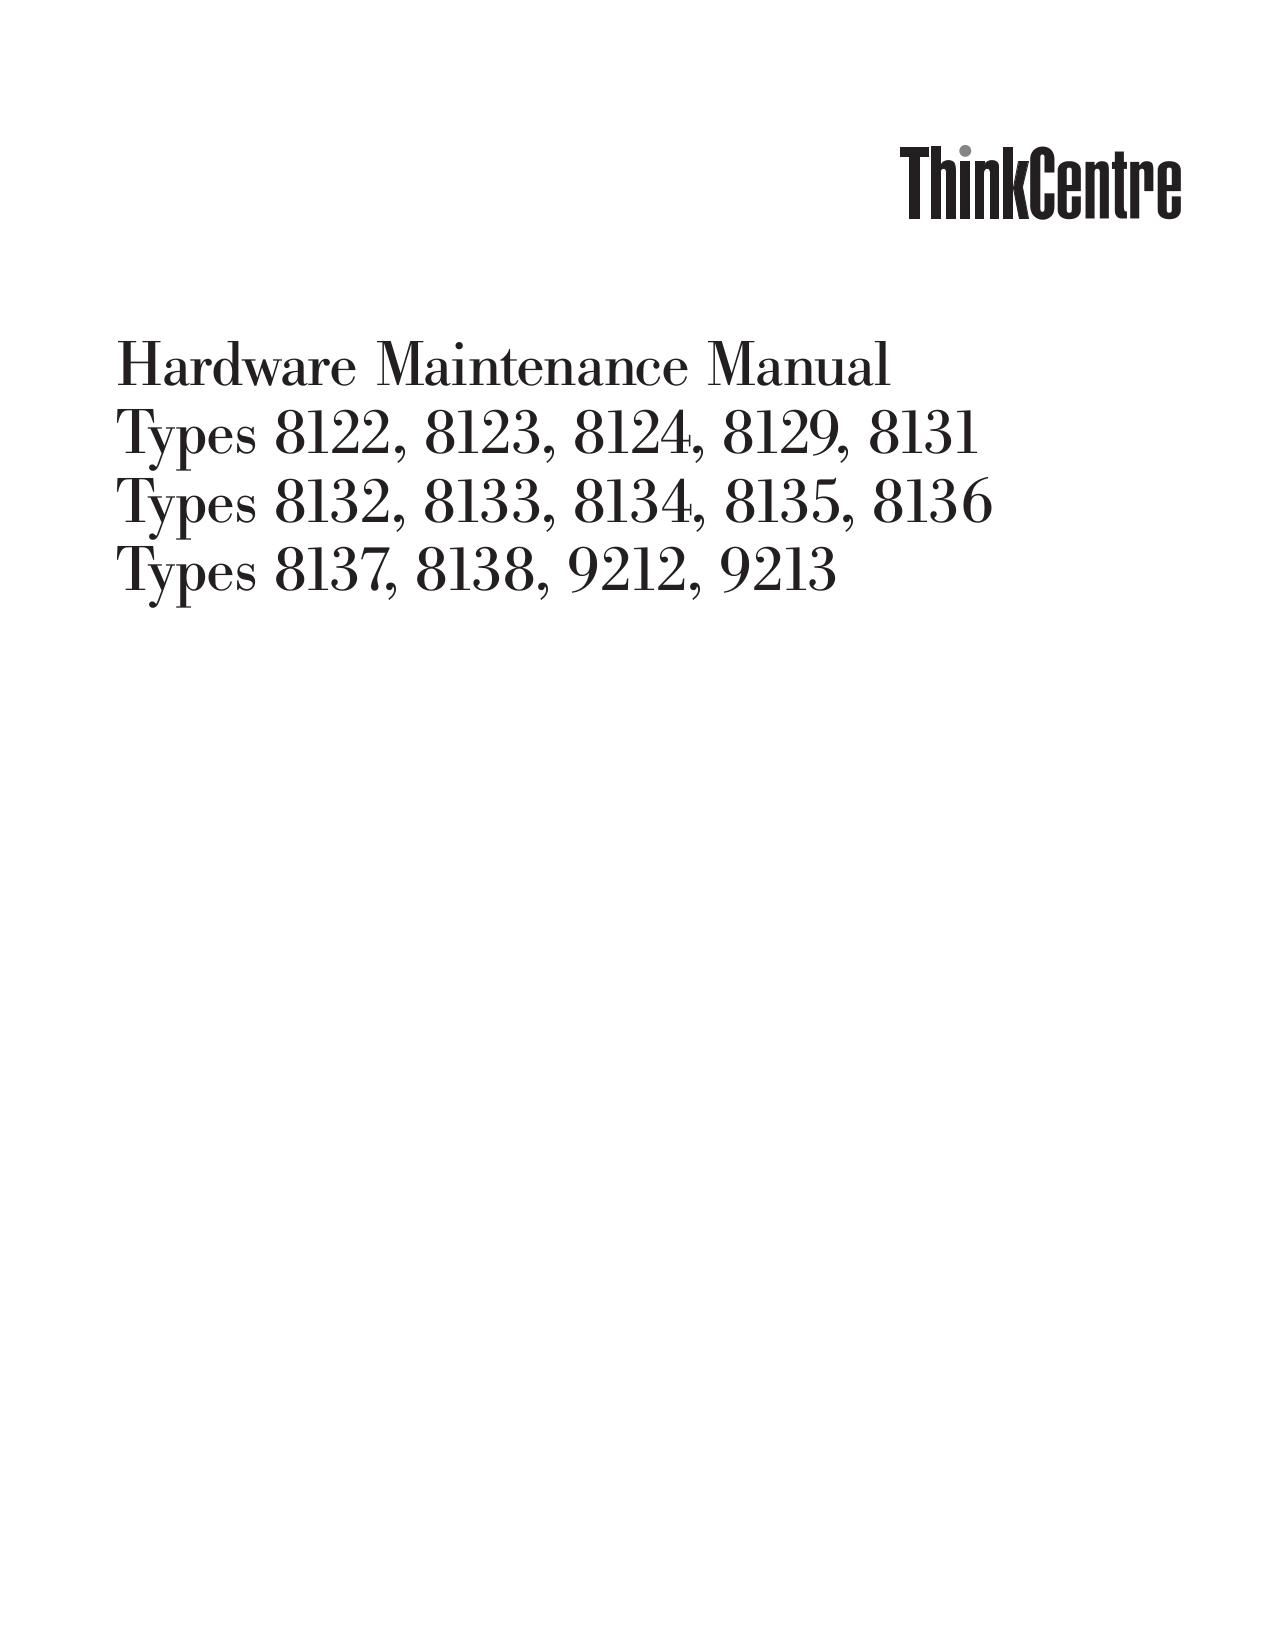 pdf for Lenovo Desktop ThinkCentre A51 8129 manual